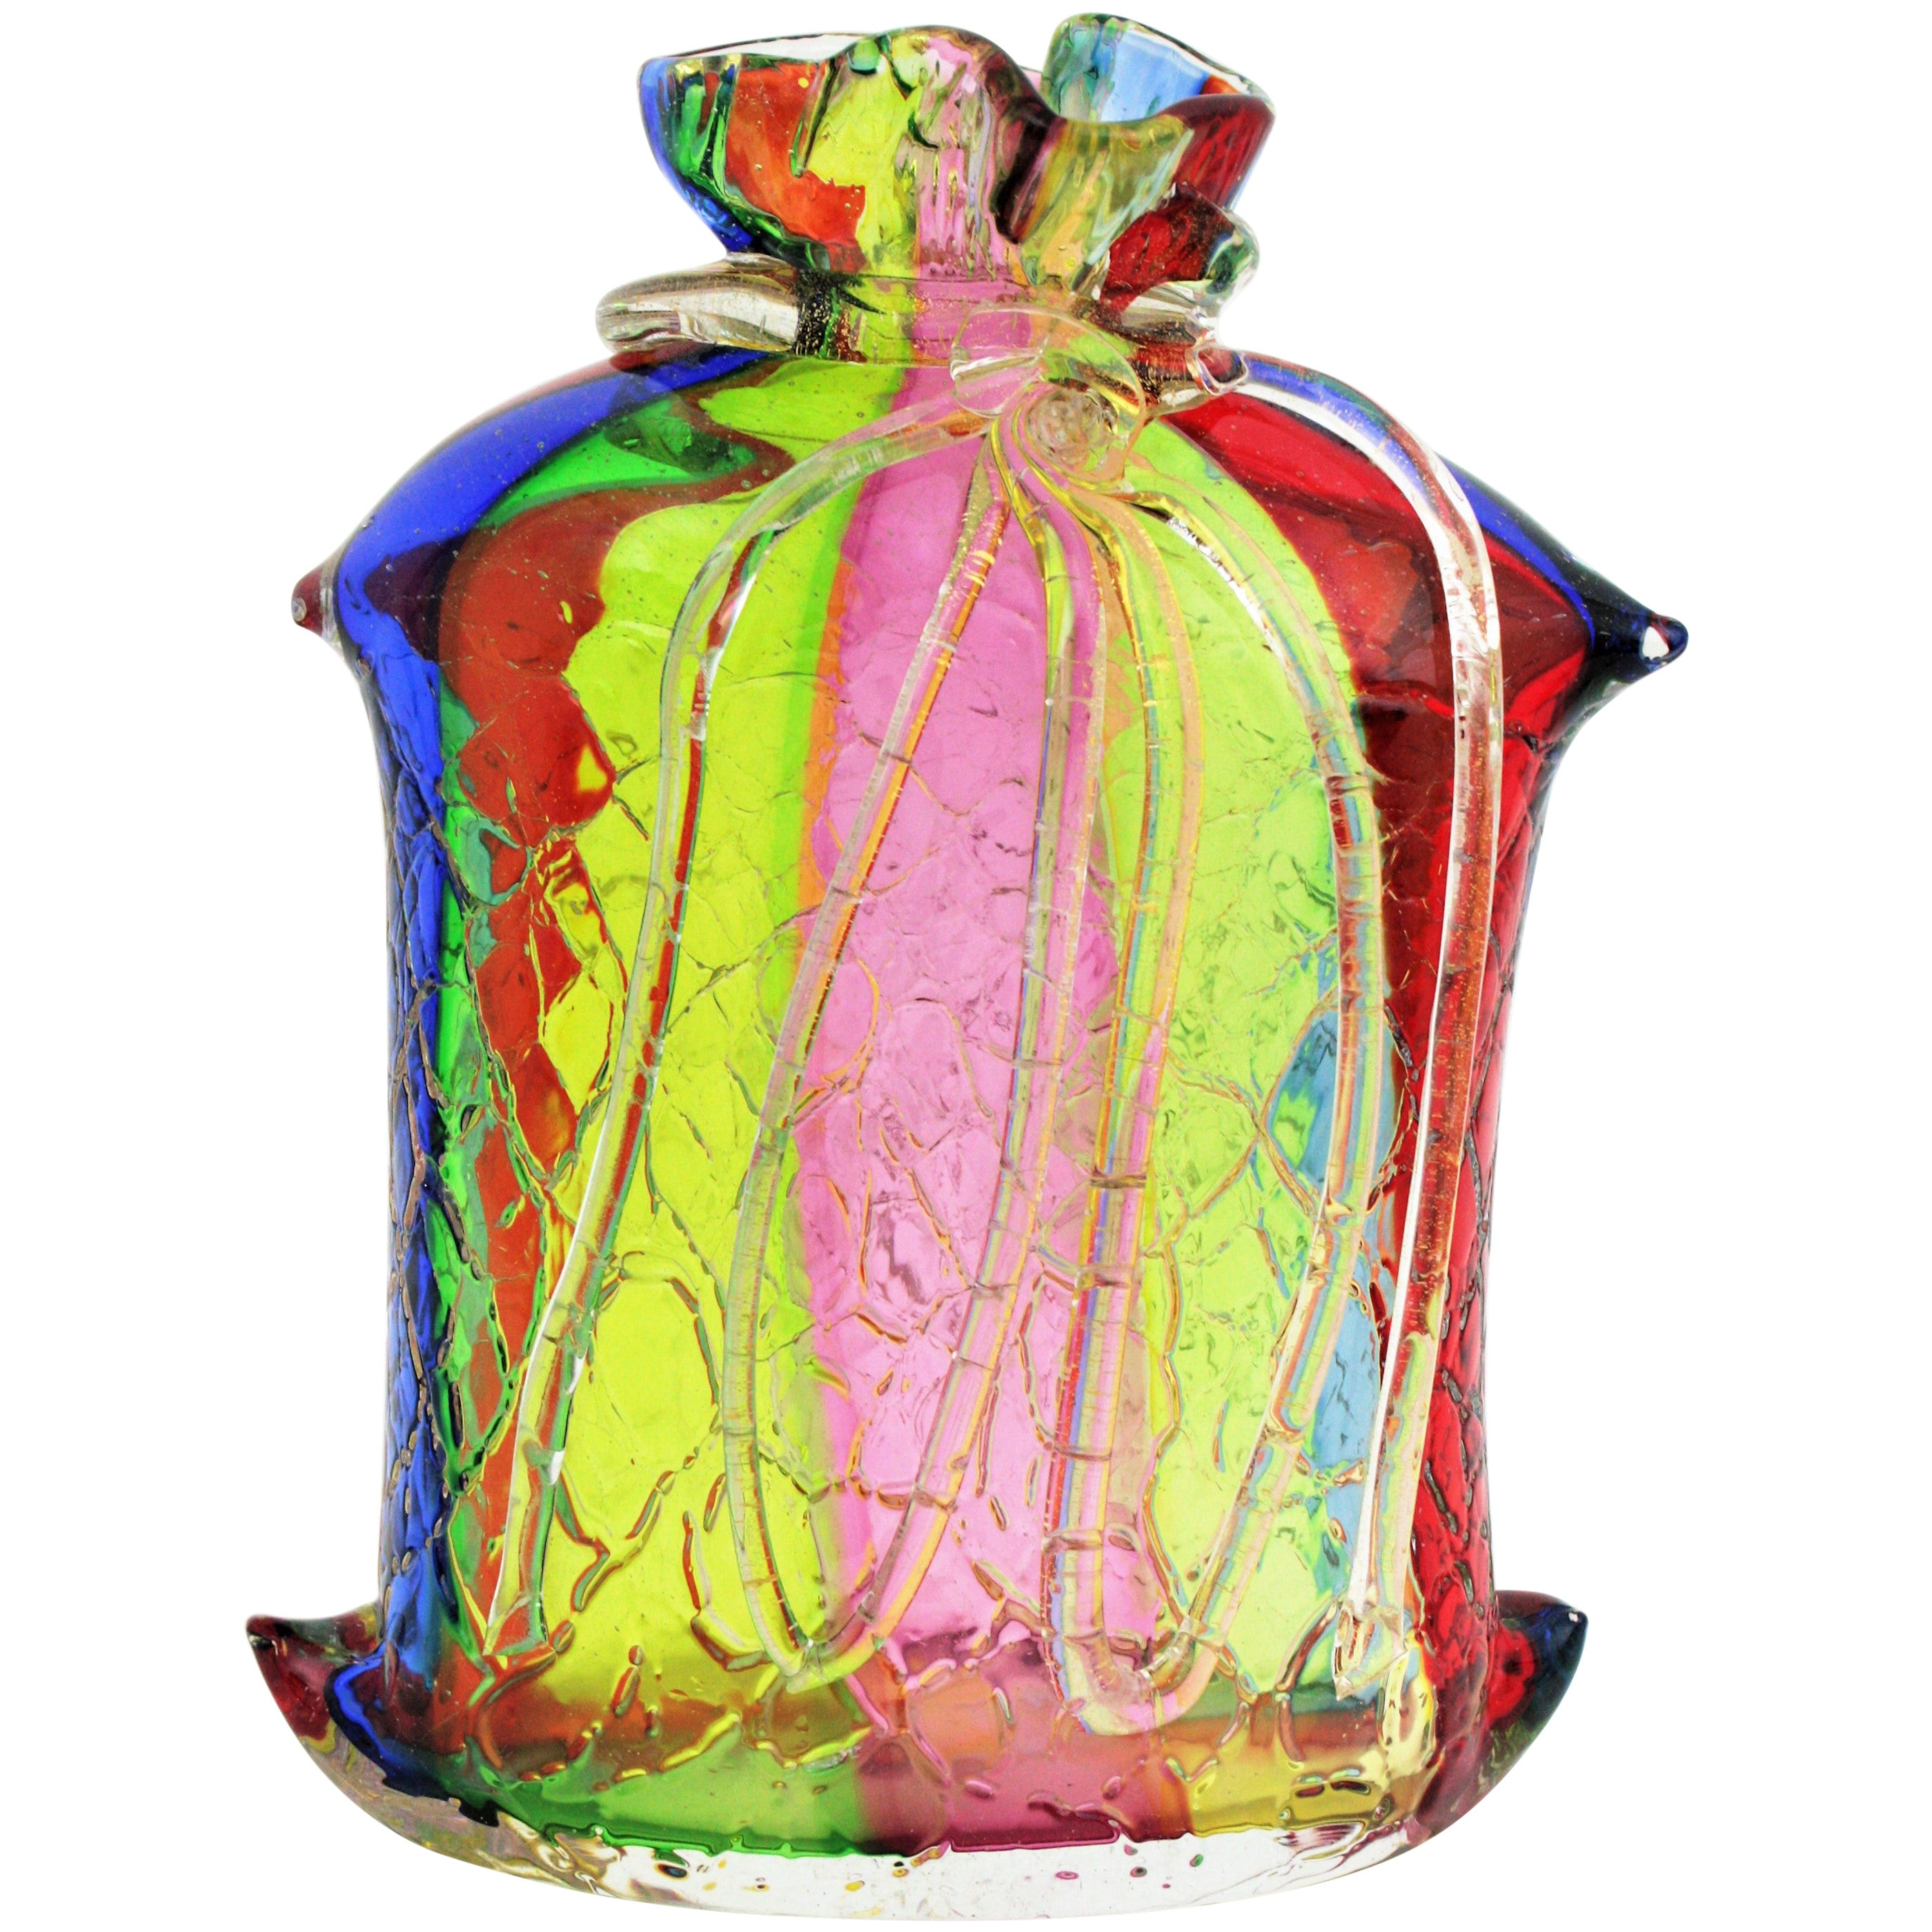 Fratelli Toso Murano Rainbow Ribbons Glass Vase with Gold Flecks